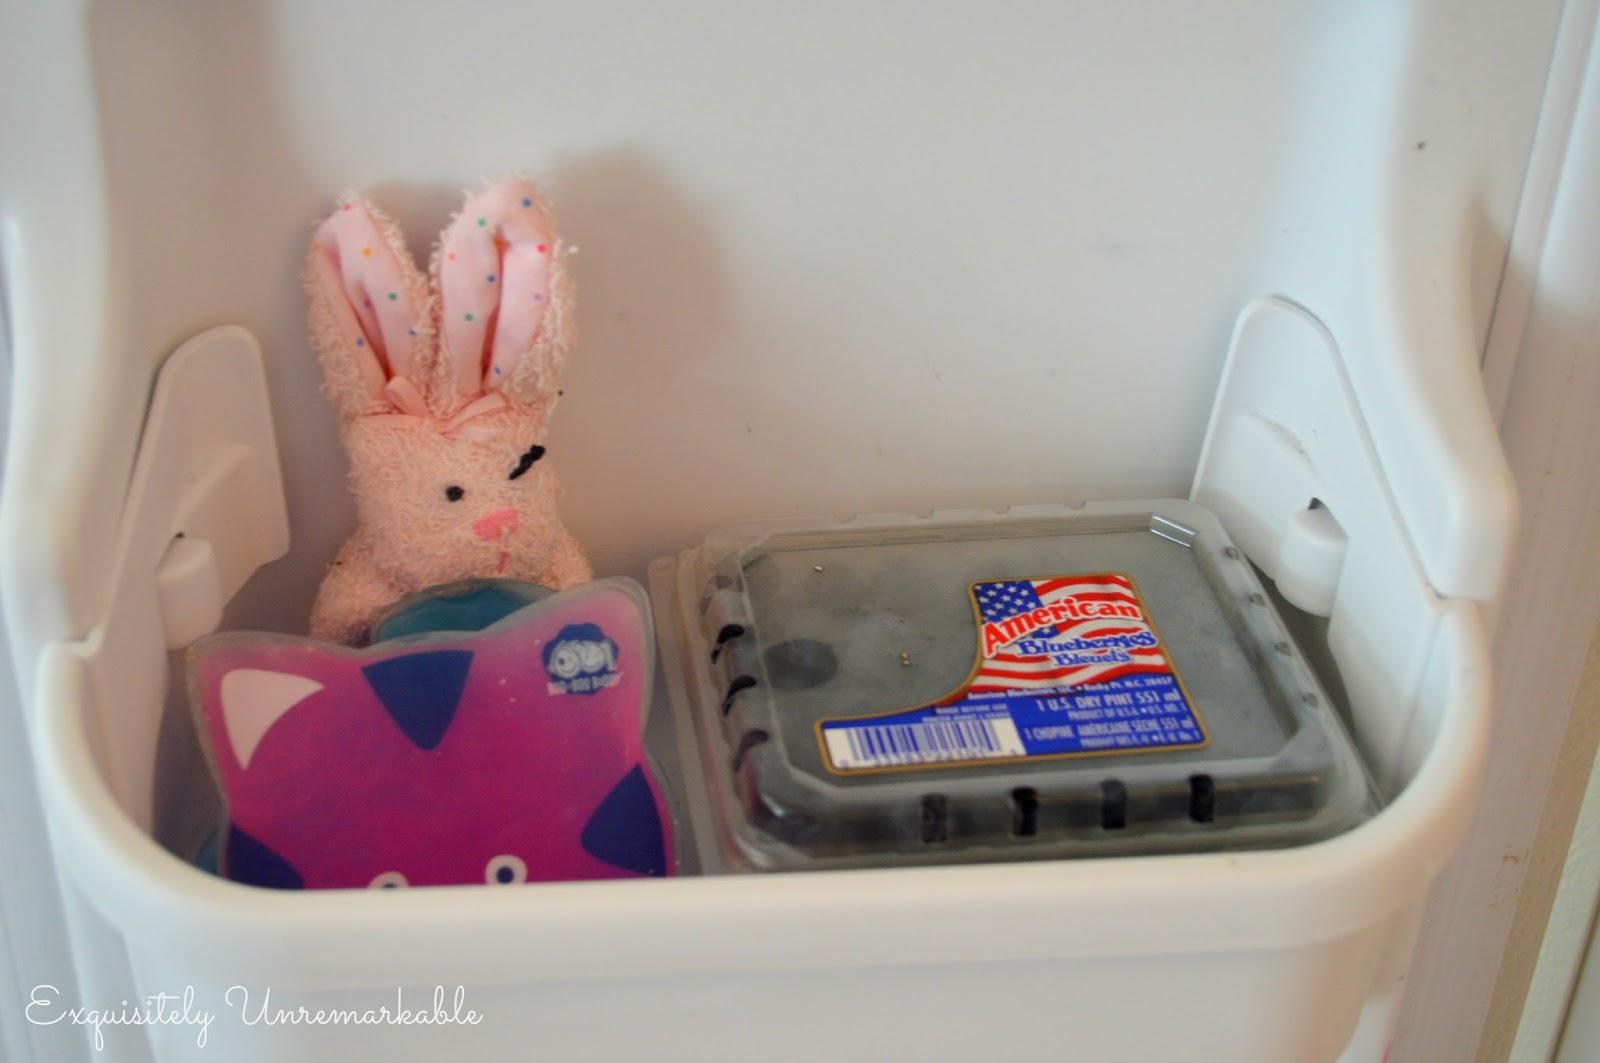 Frozen blueberries and boo boo ice packs on the freezer door